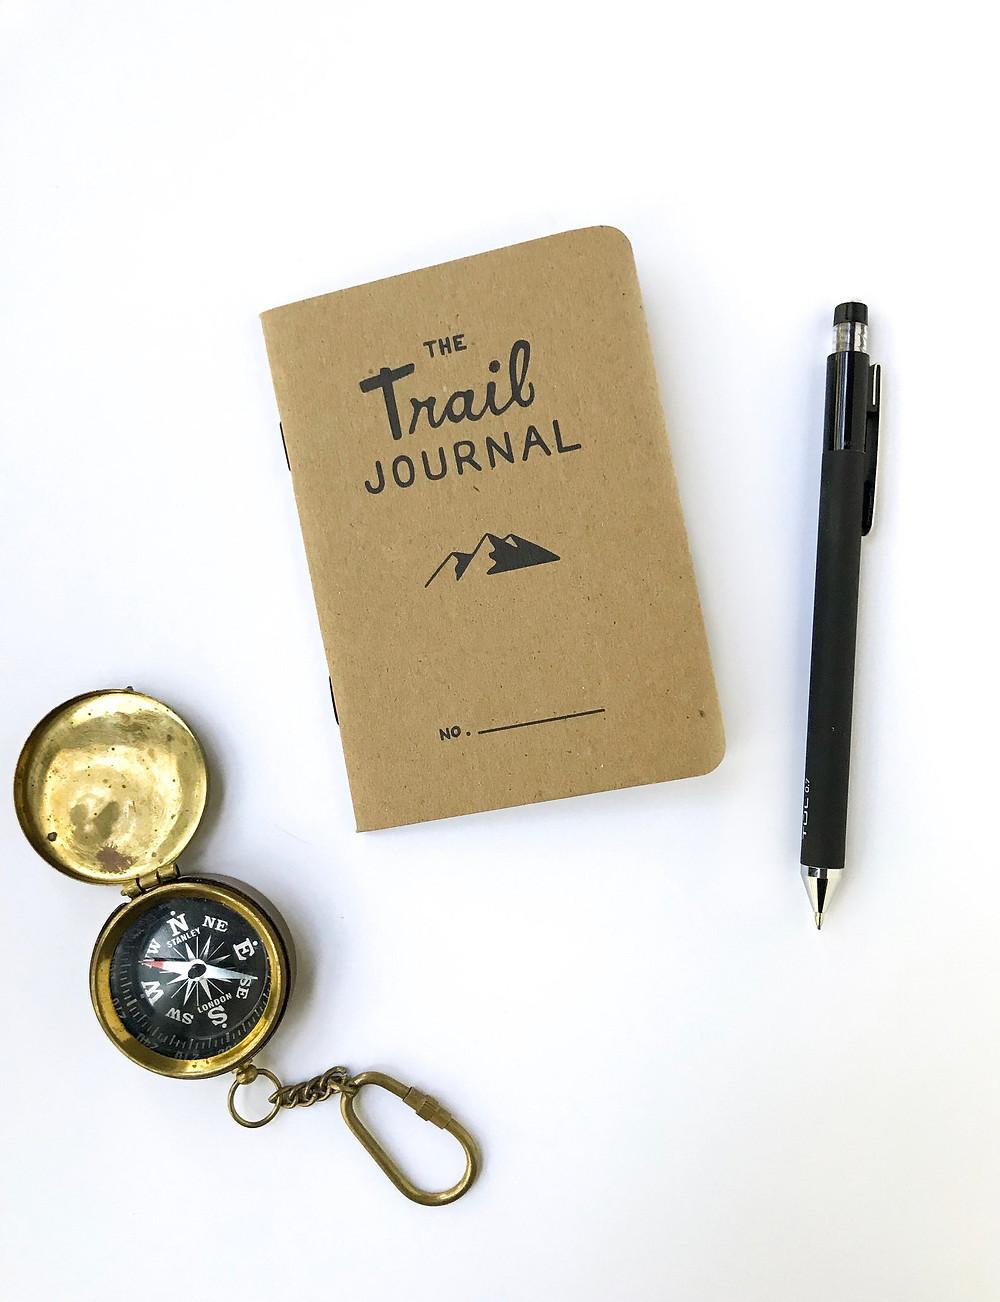 hiking journal for patagonia trip